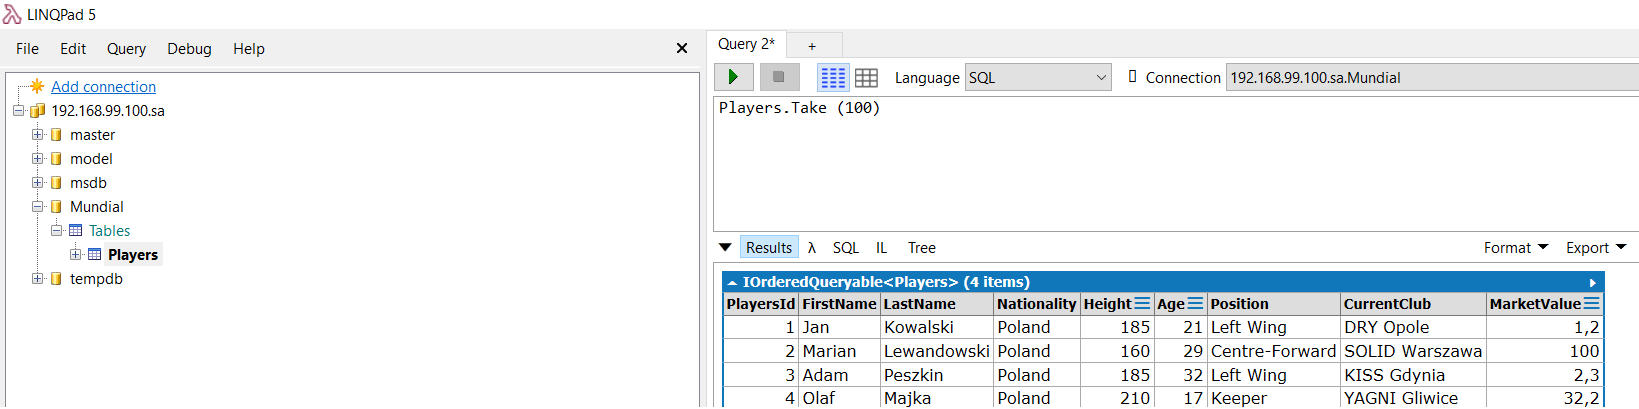 LINQPad 5 connected SQL Server